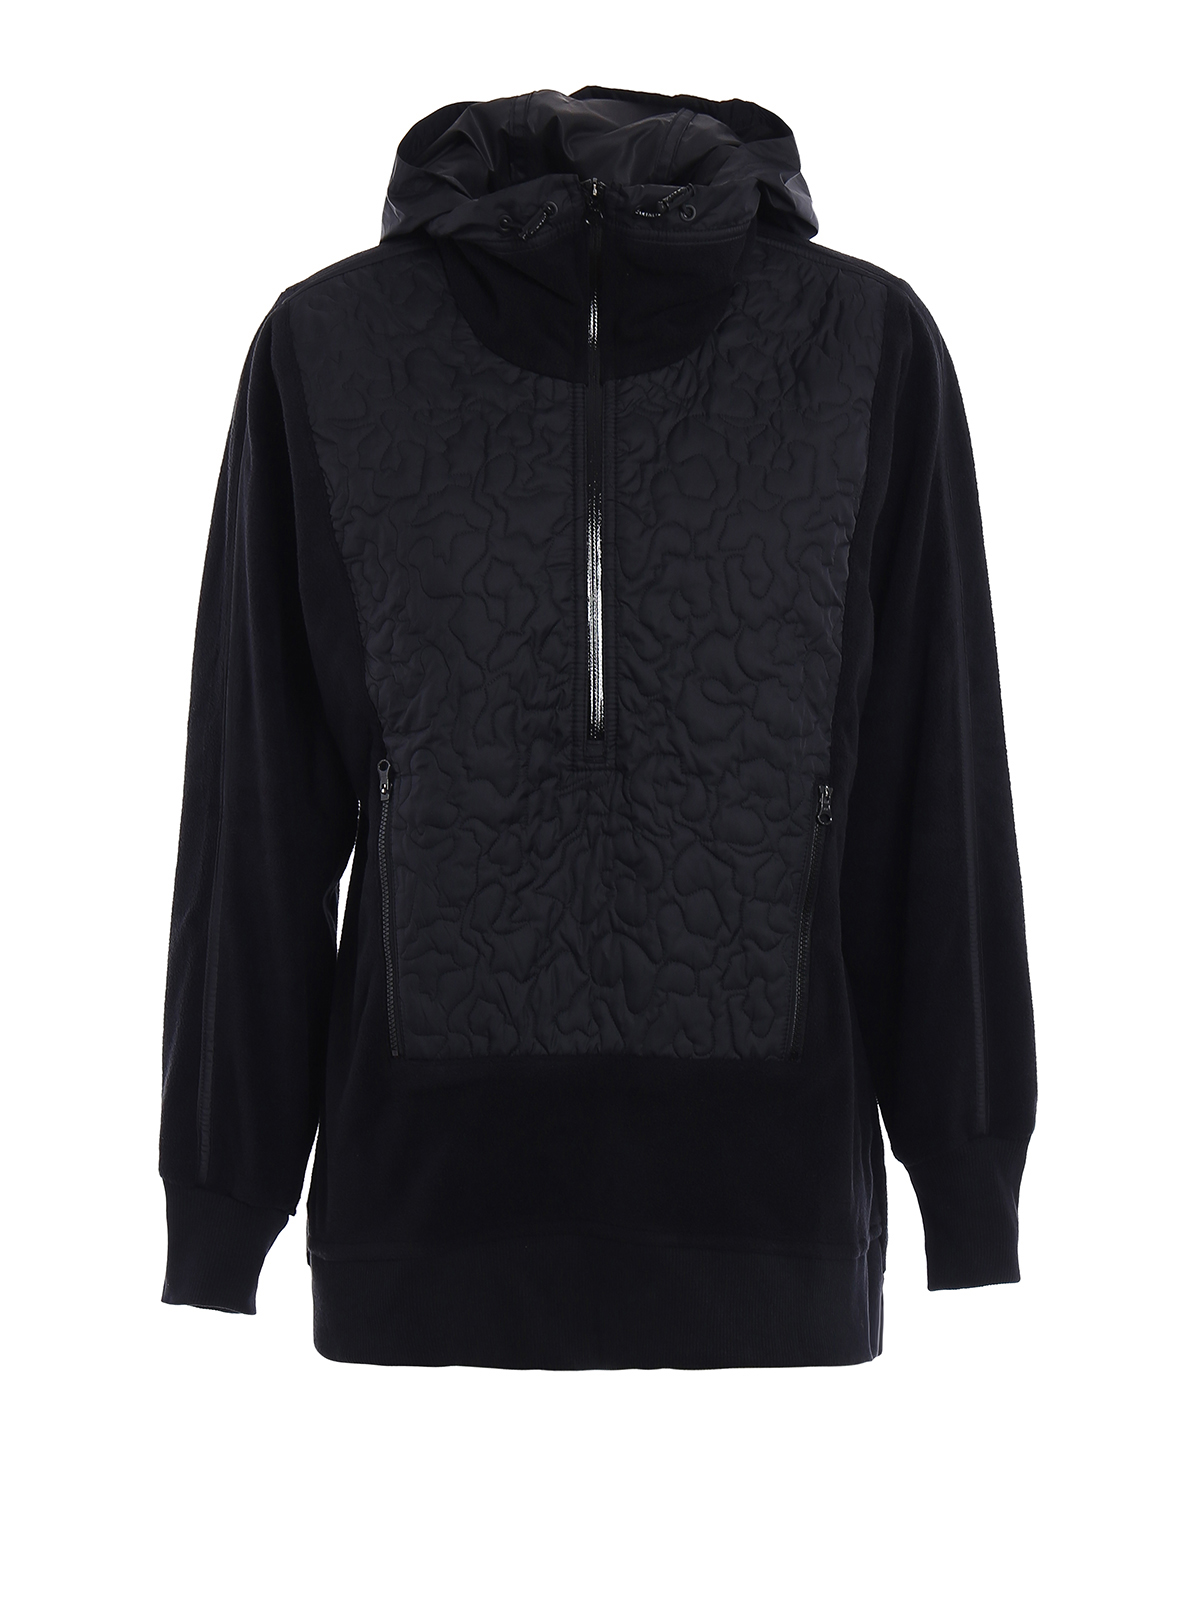 e963c6984d2b2 ADIDAS BY STELLA MCCARTNEY: Sweatshirts & Sweaters - Run Polar fleece  sweatshirt